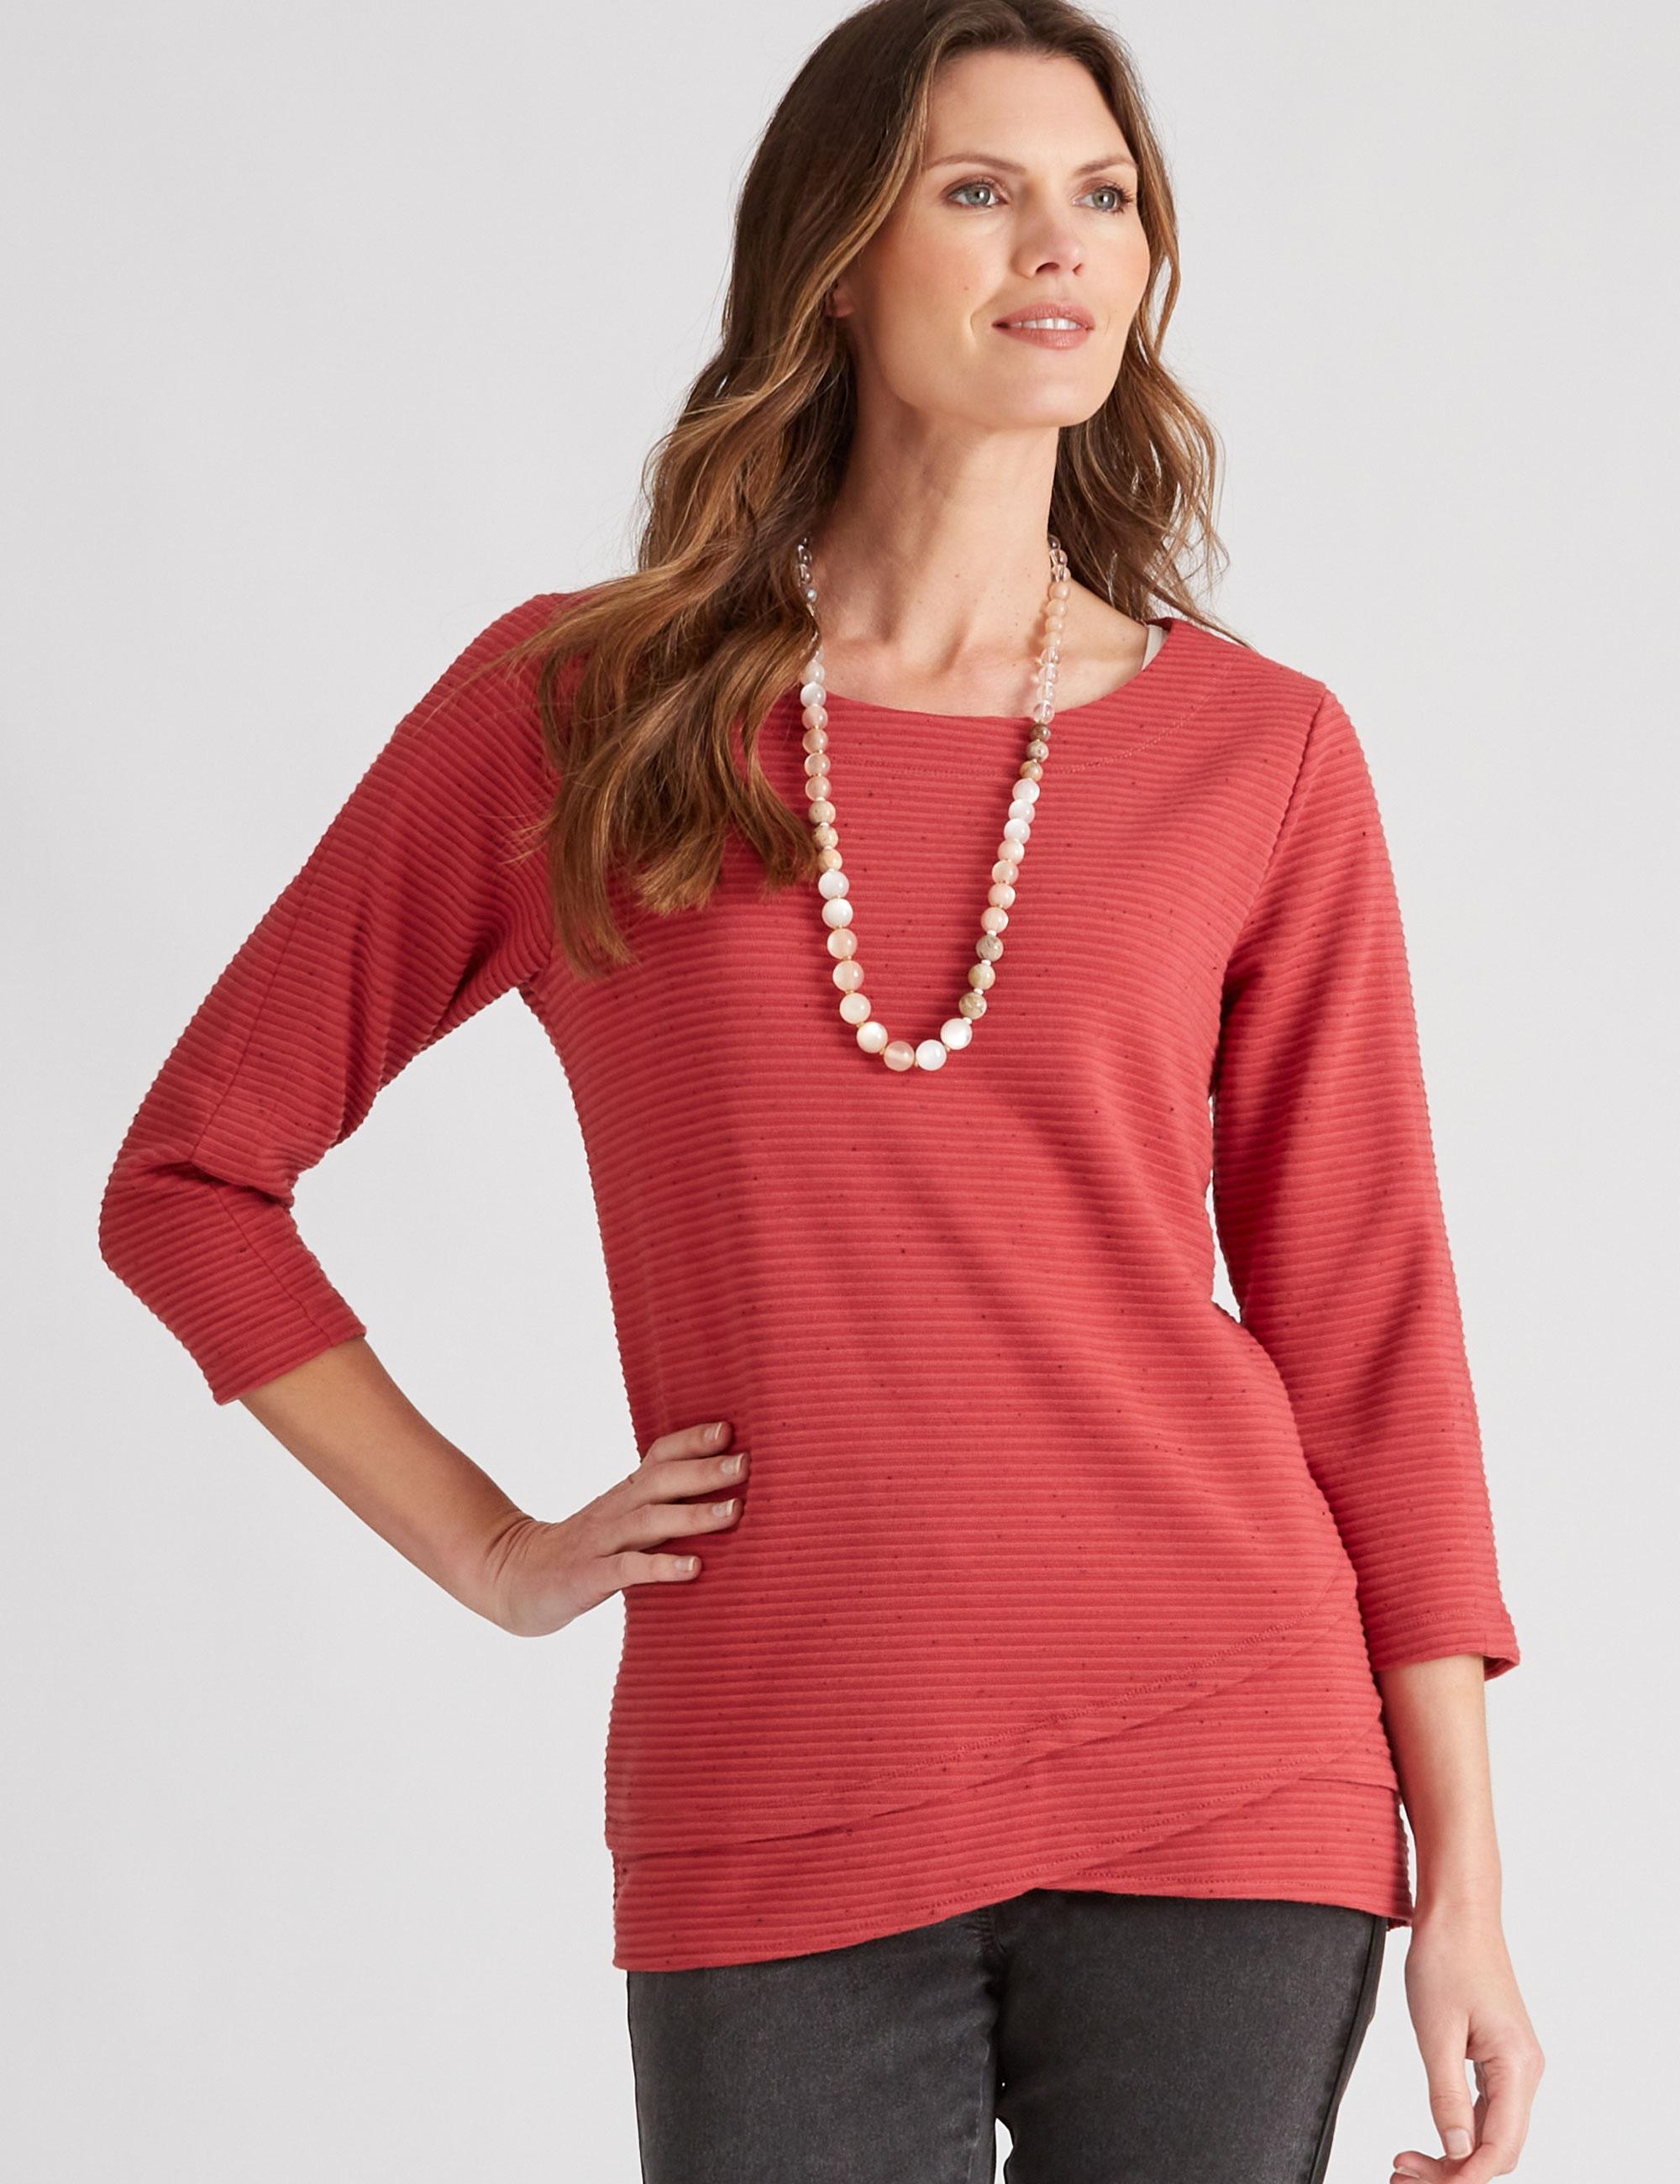 1056781630 1 - Women Fashion